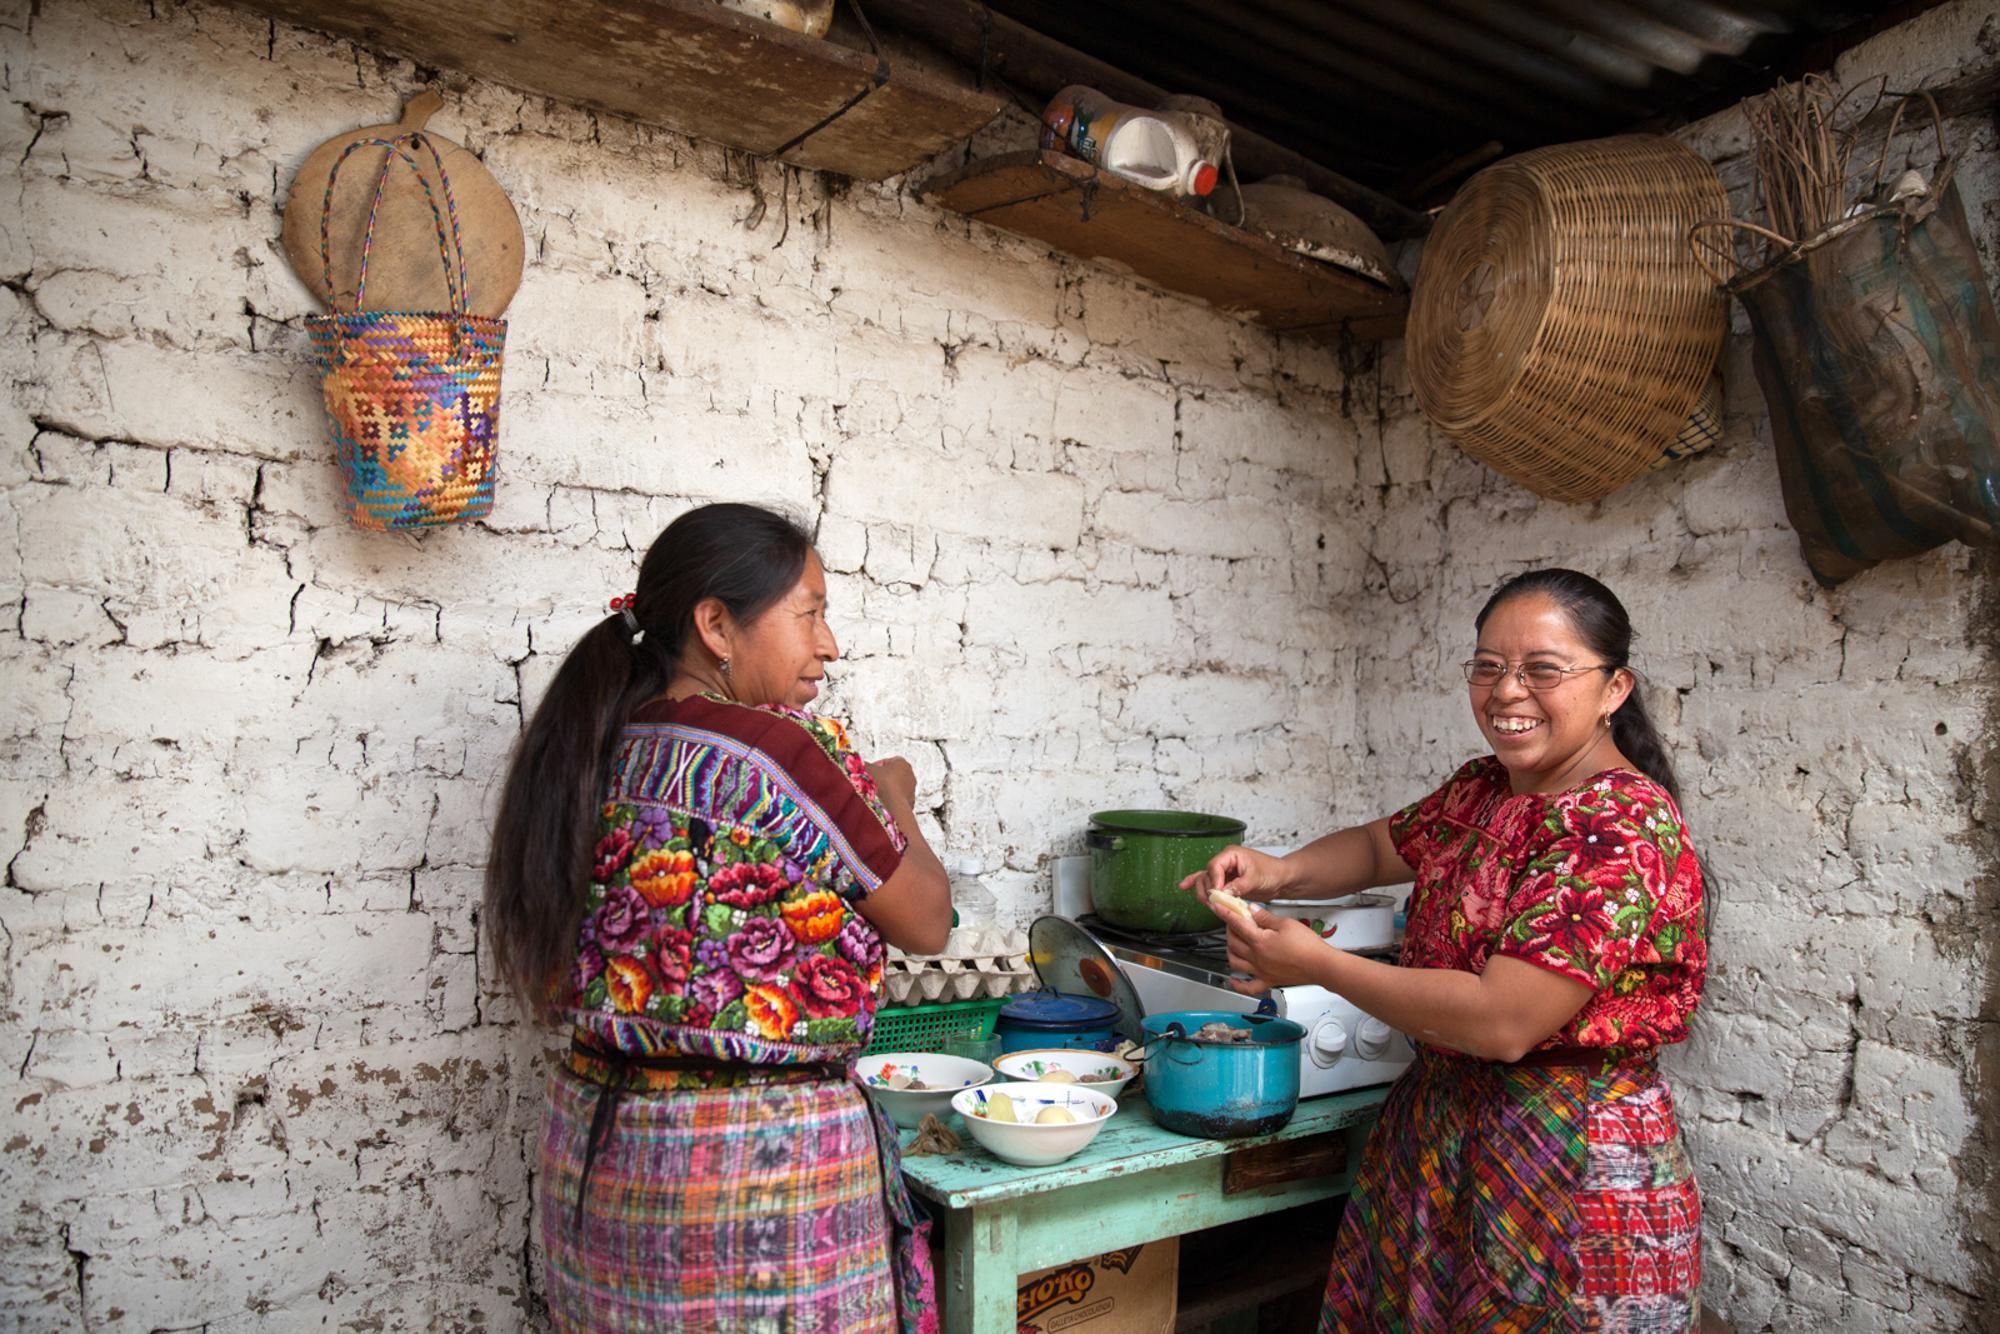 Gloria Marina Icu Puluc (R), midwife from the Asociación Civil de Comadronas Tradicionales de Chimaltenango, Guatemala